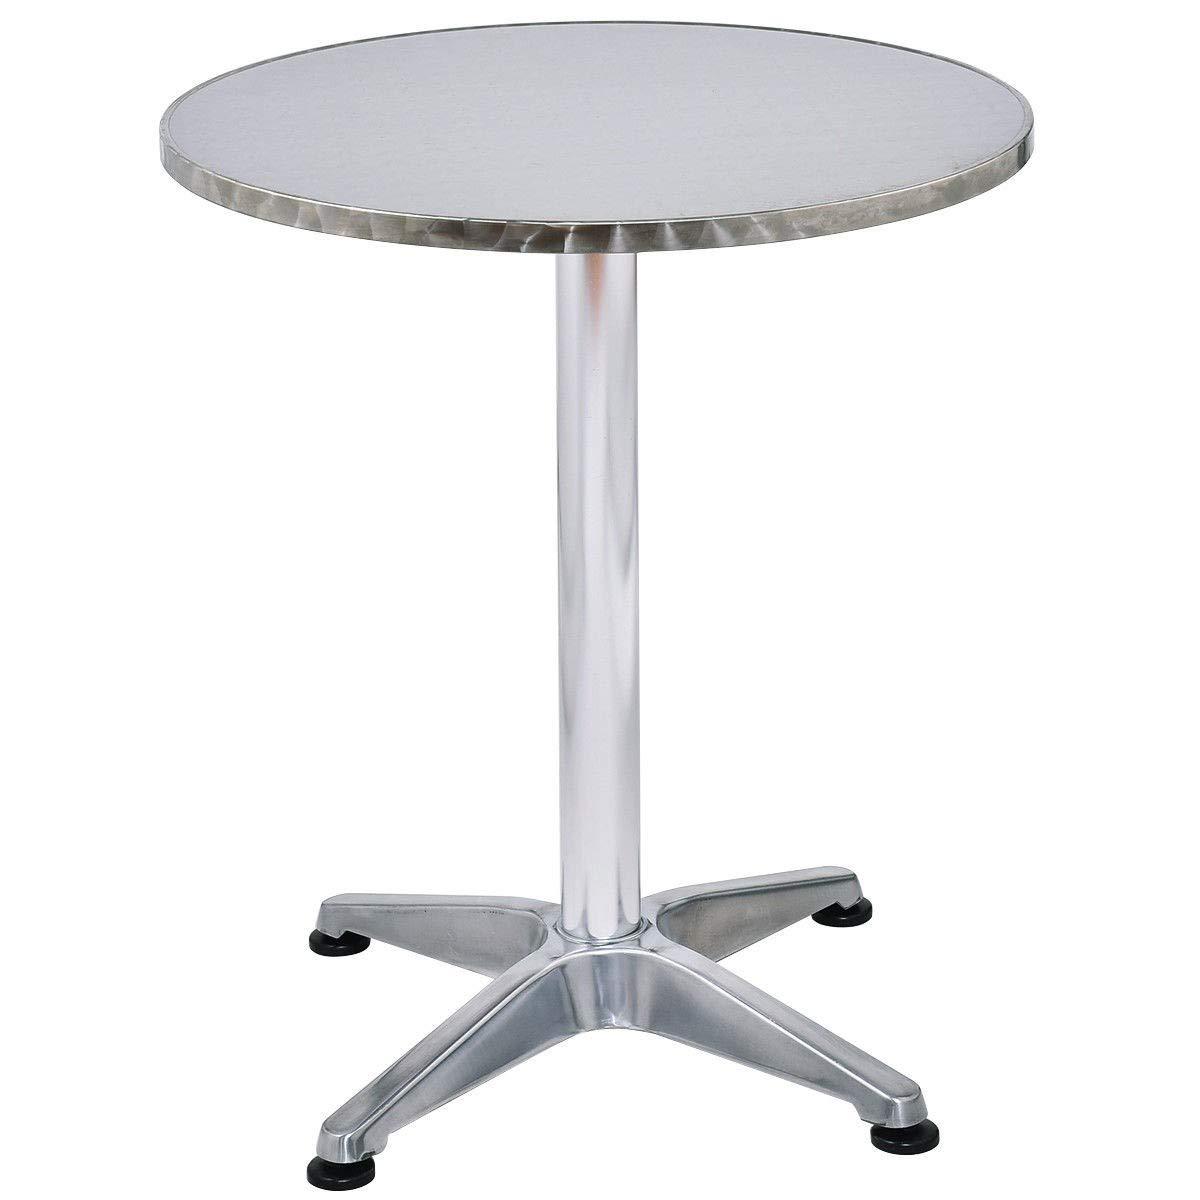 EnjoyShop 23 1/2'' Stainless Steel Aluminium Round Cafe Bistro Table Table Light-Weight Waterproof Outdoor Restaurant Metal